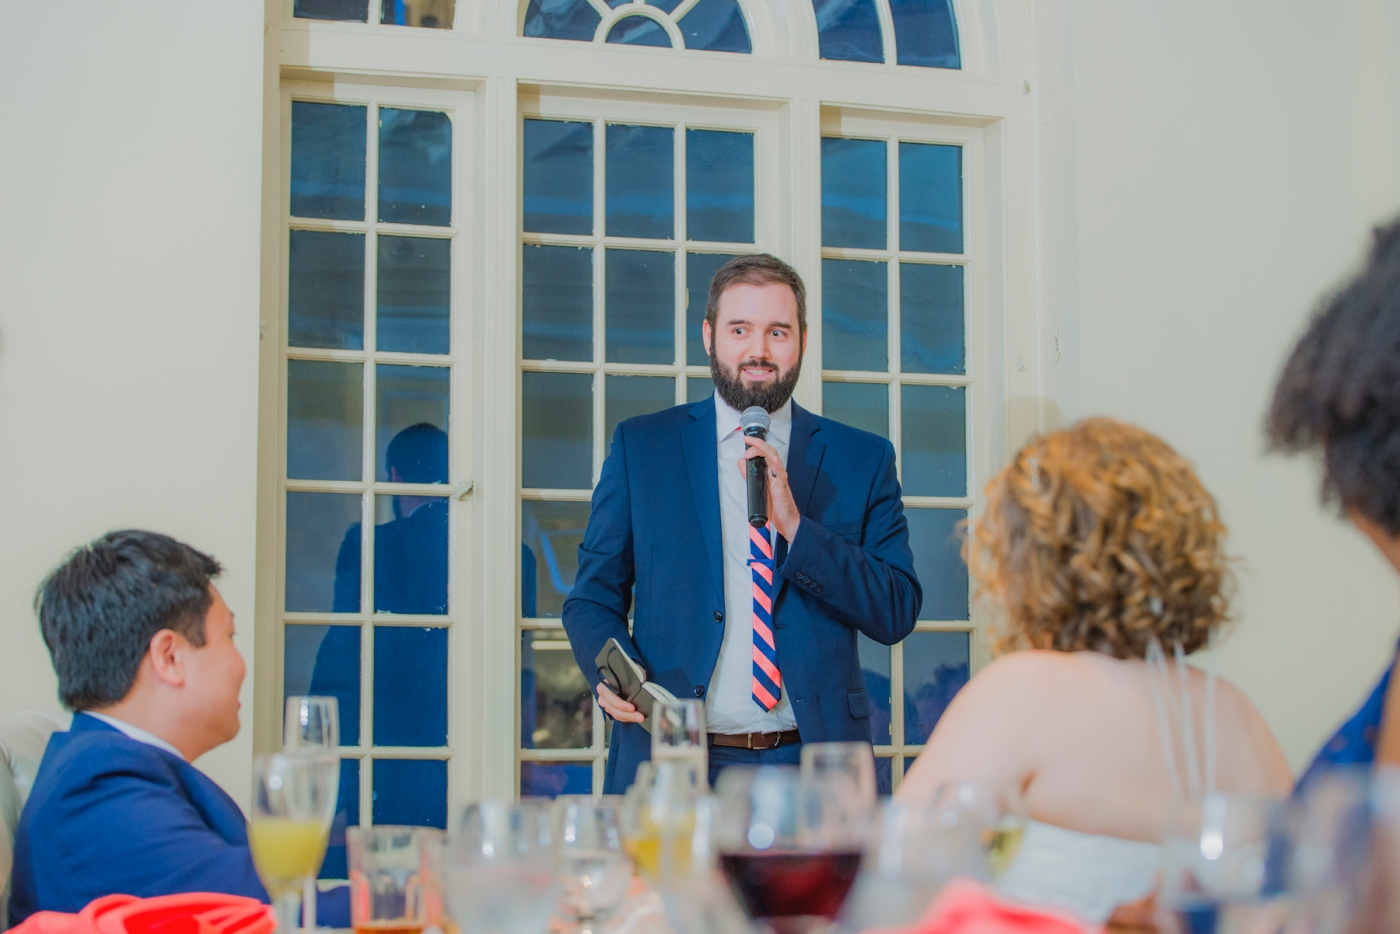 DSC_3254Everett_Wedding_Ballroom_Jane_Speleers_photography_Rachel_and_Edmund_reception_2017